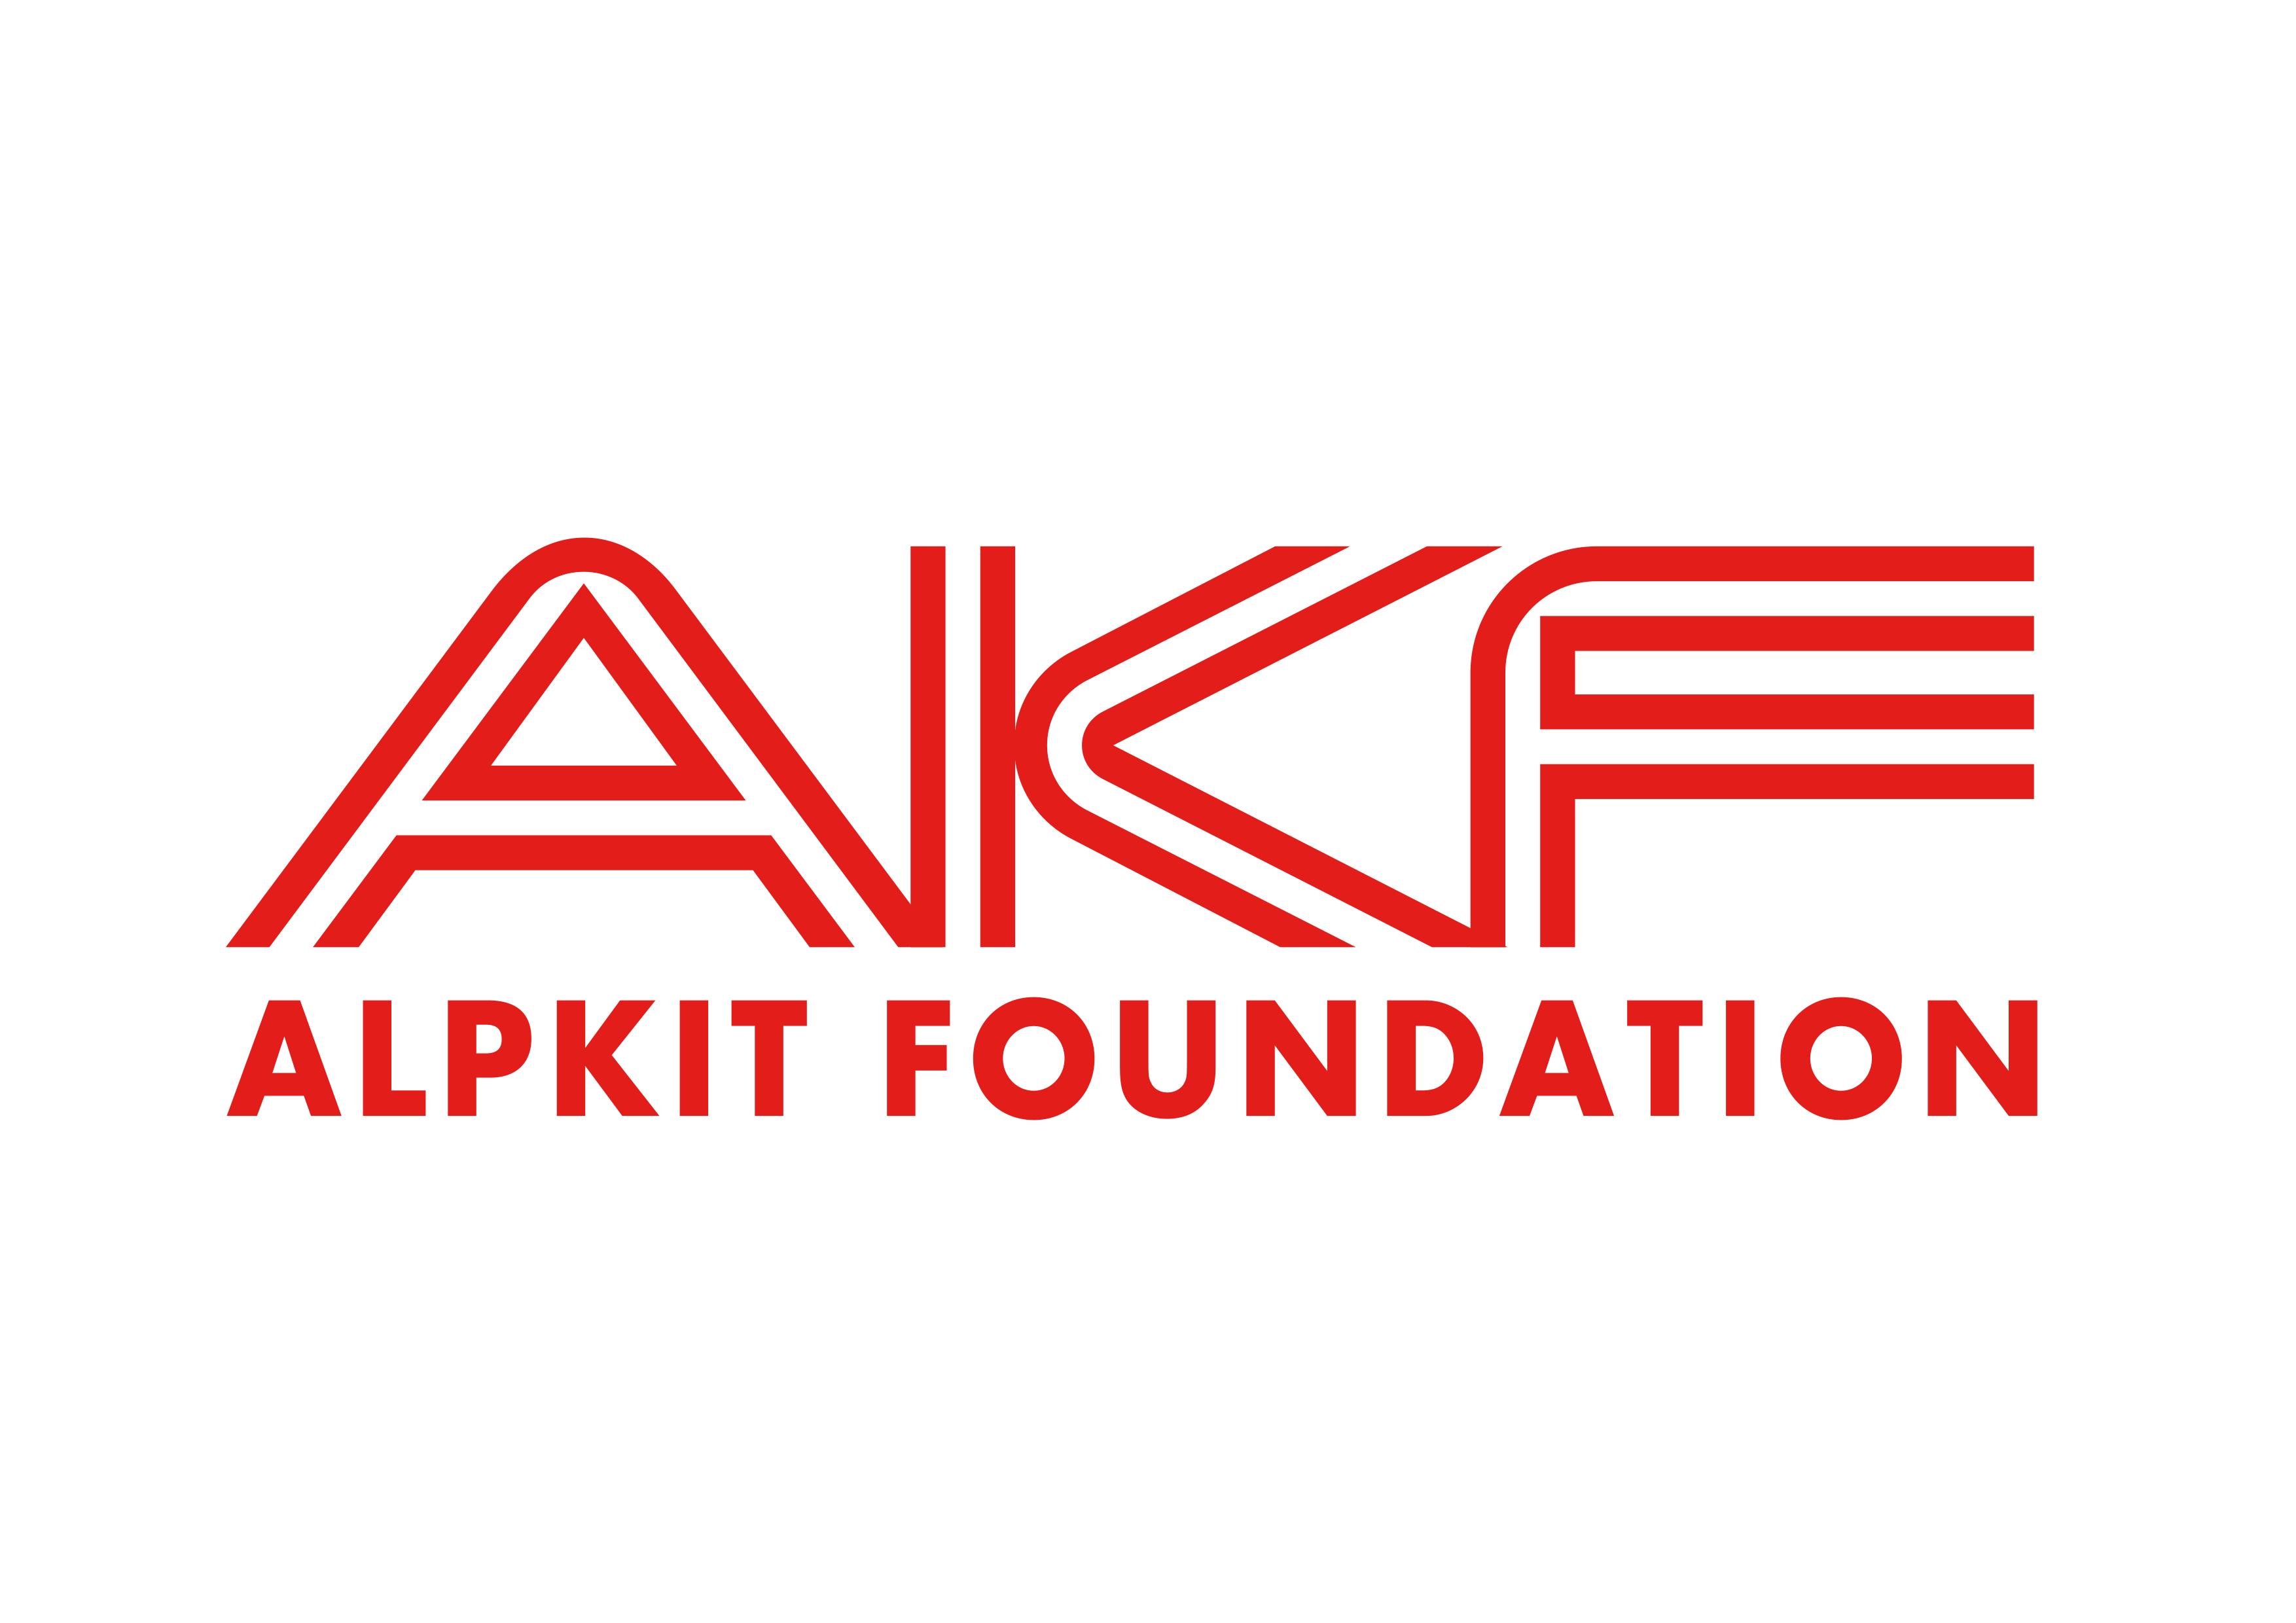 AKF-alpkit-foundation